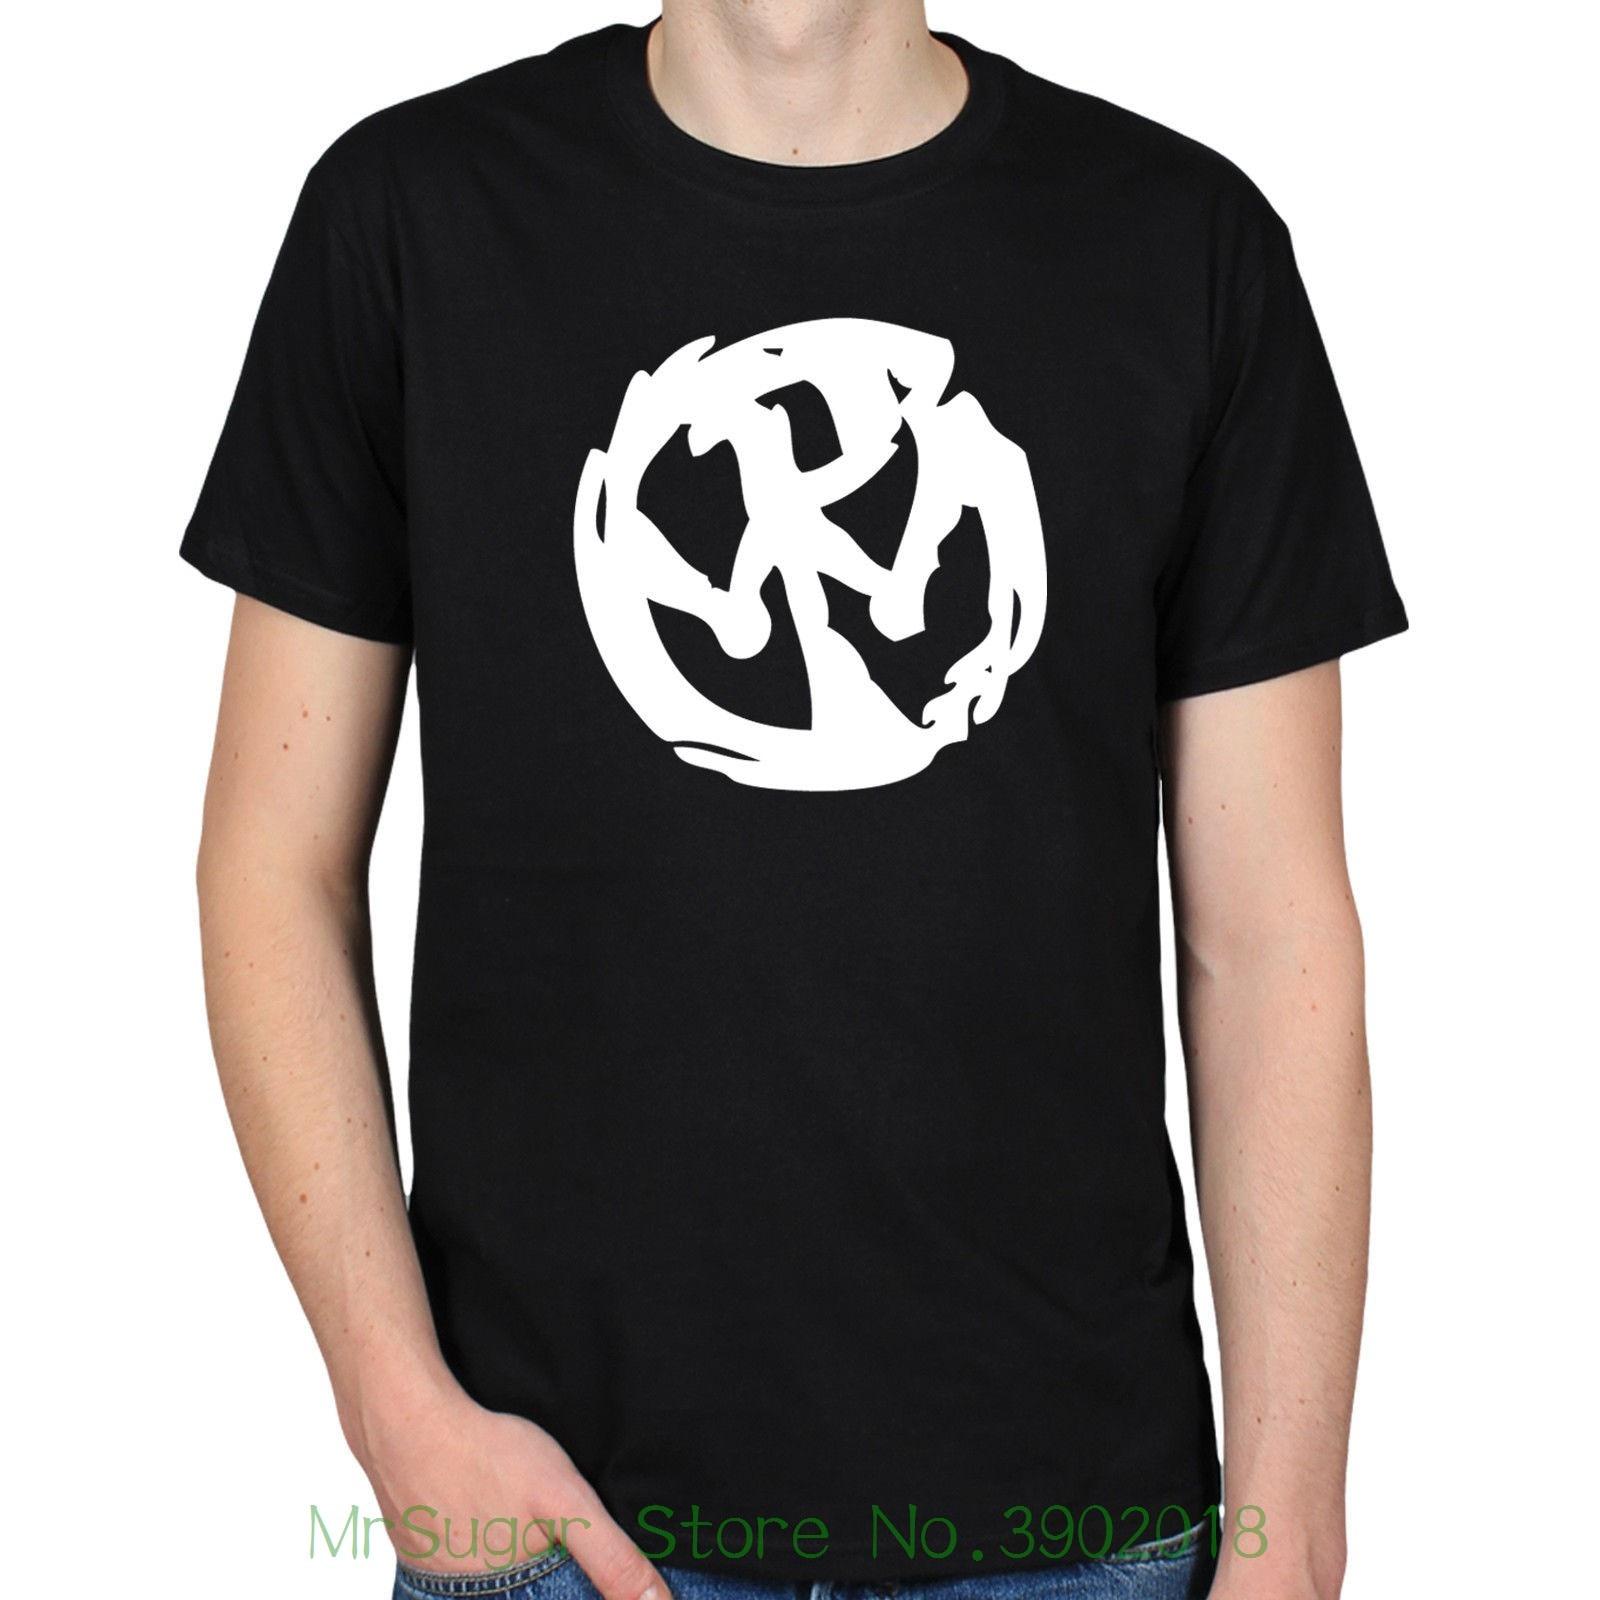 Pennywise  Hardcore Punk Epitaph Logo Skate 90s Band Music Classic Tee Shirt Casual Short Sleeve